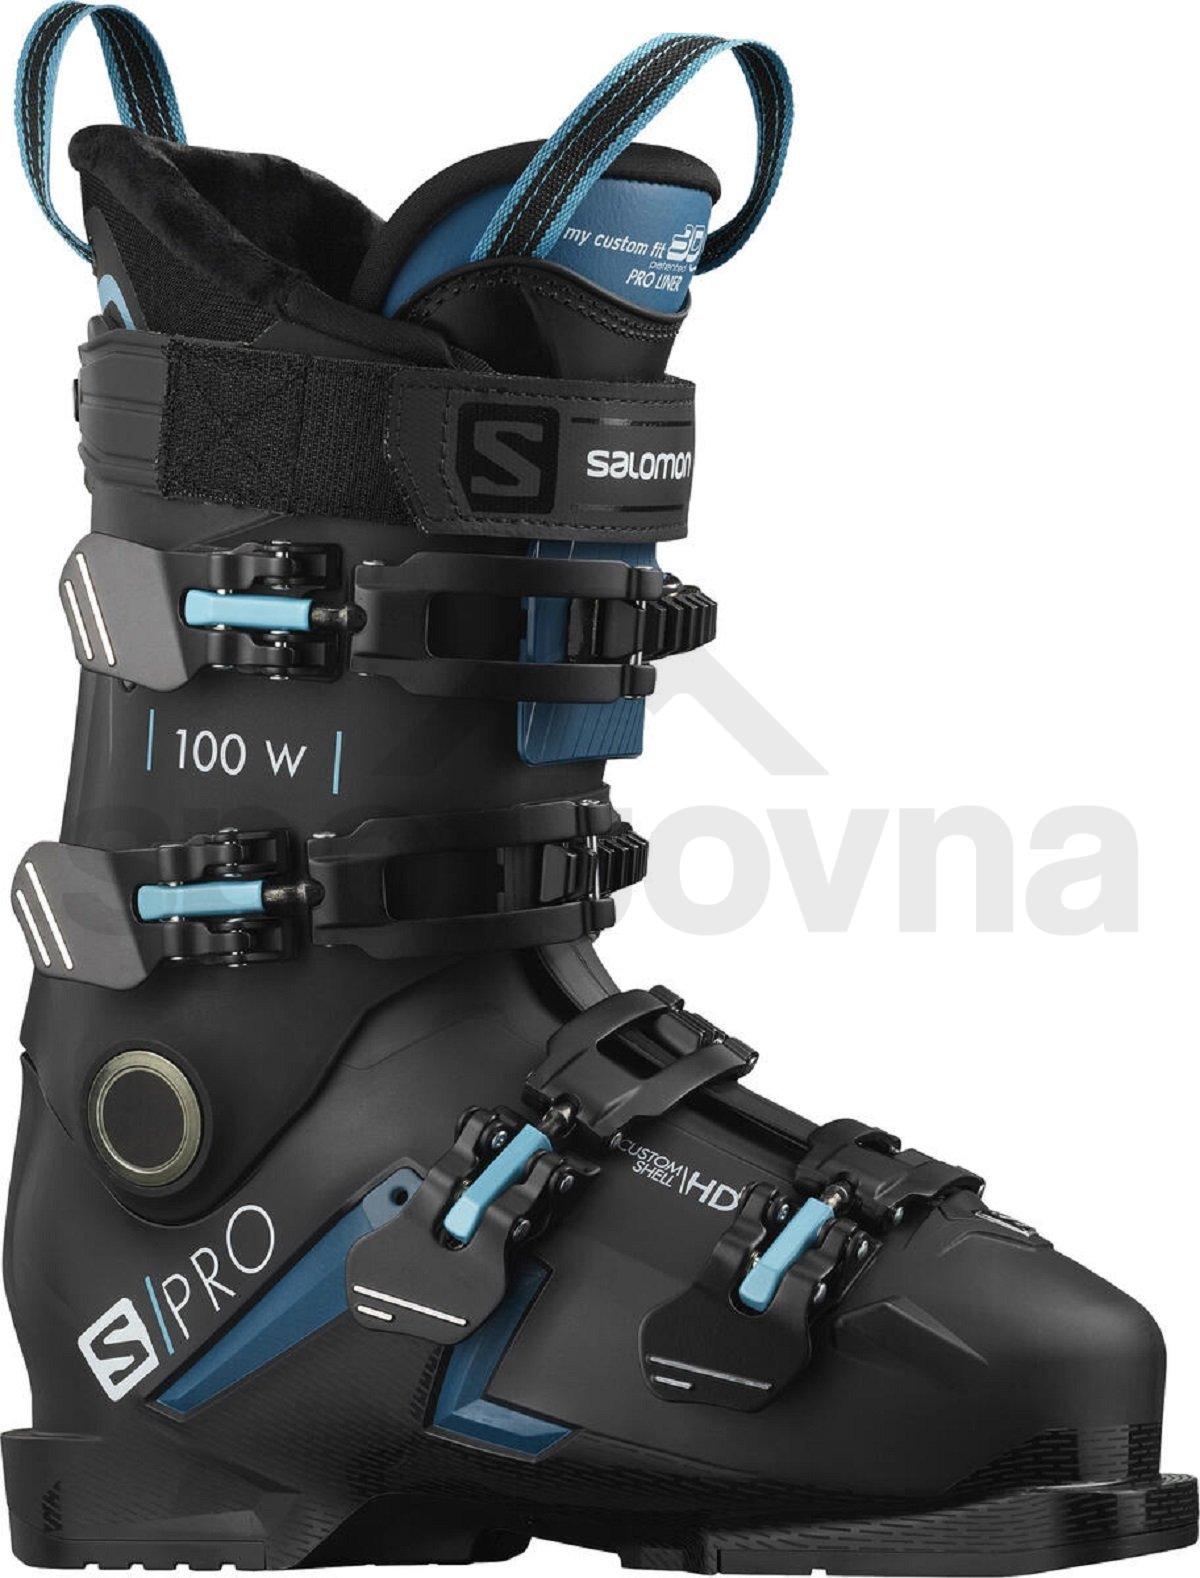 l40875700-0-gho-w-s-pro-100w-black-blue-scuba-jpg-cq5dam-web-1200-1200